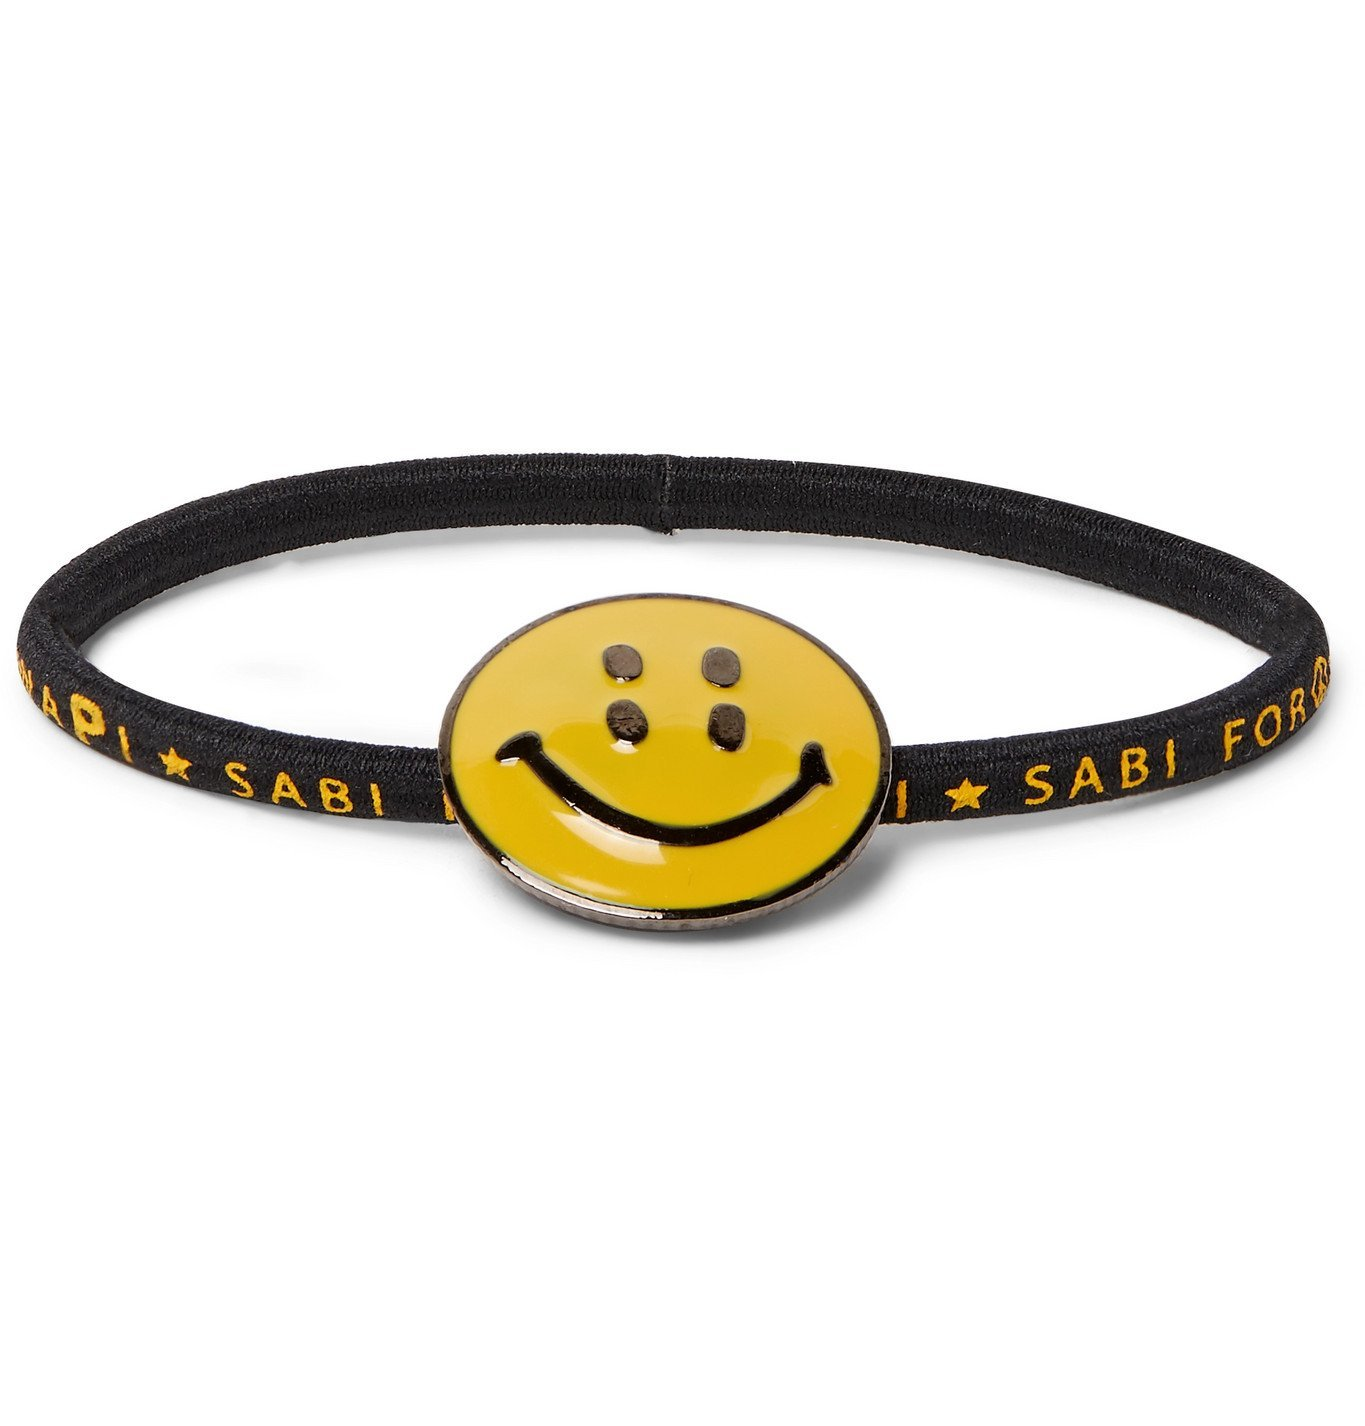 KAPITAL - Enamel, Gunmetal-Tone and Elastic Bracelet - Black